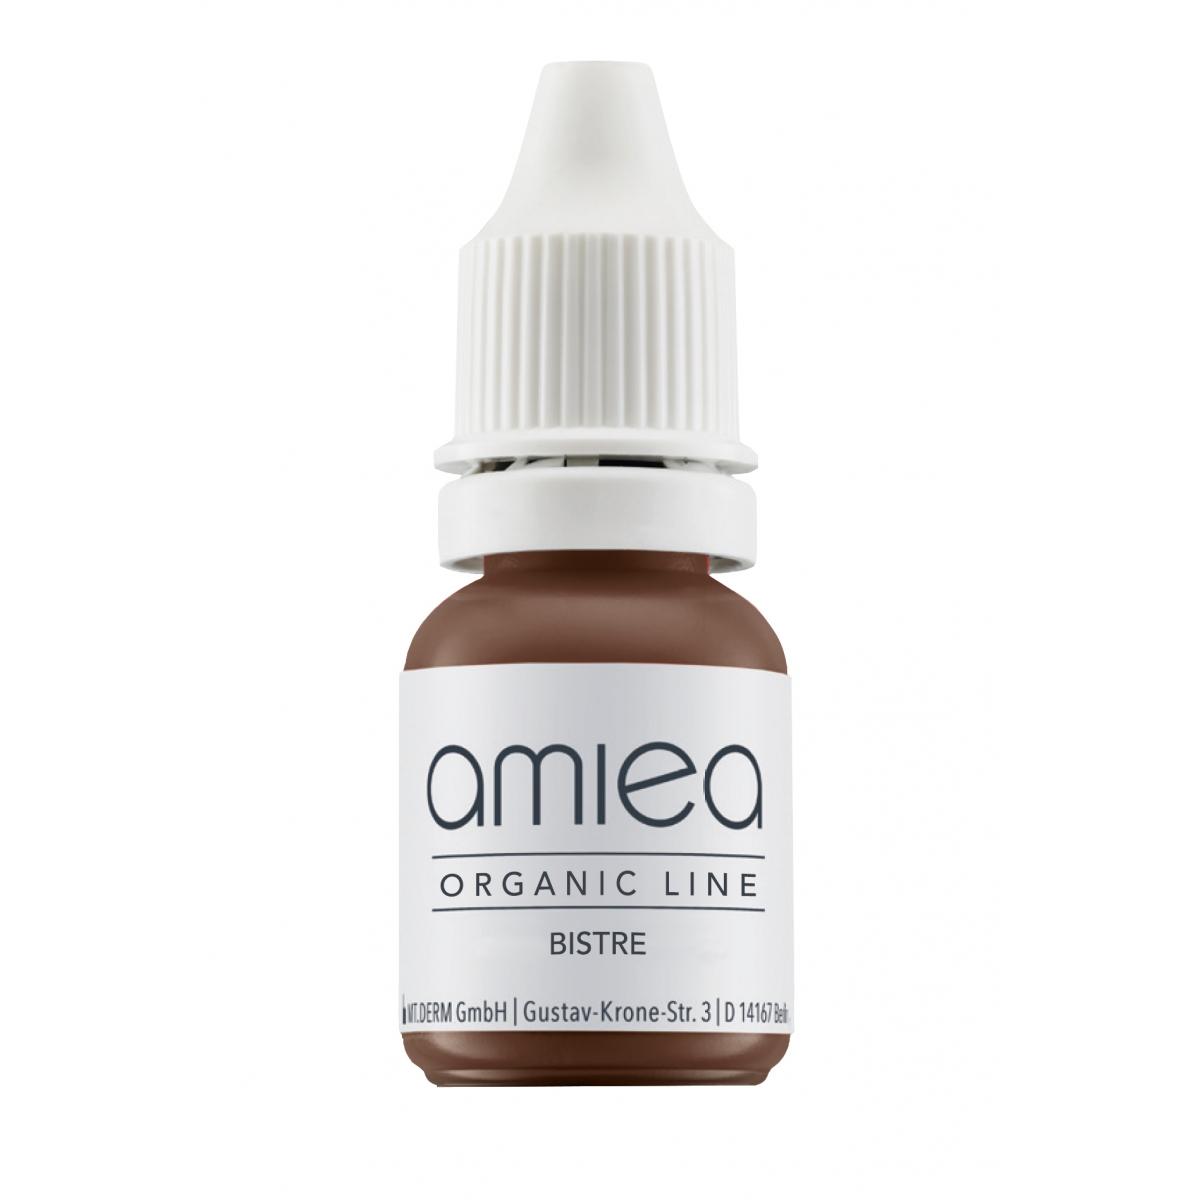 Organicline (5 ml)  - PIGMENTS AMIEA ORGANICLINE BISTRE, Flacon 5 ml